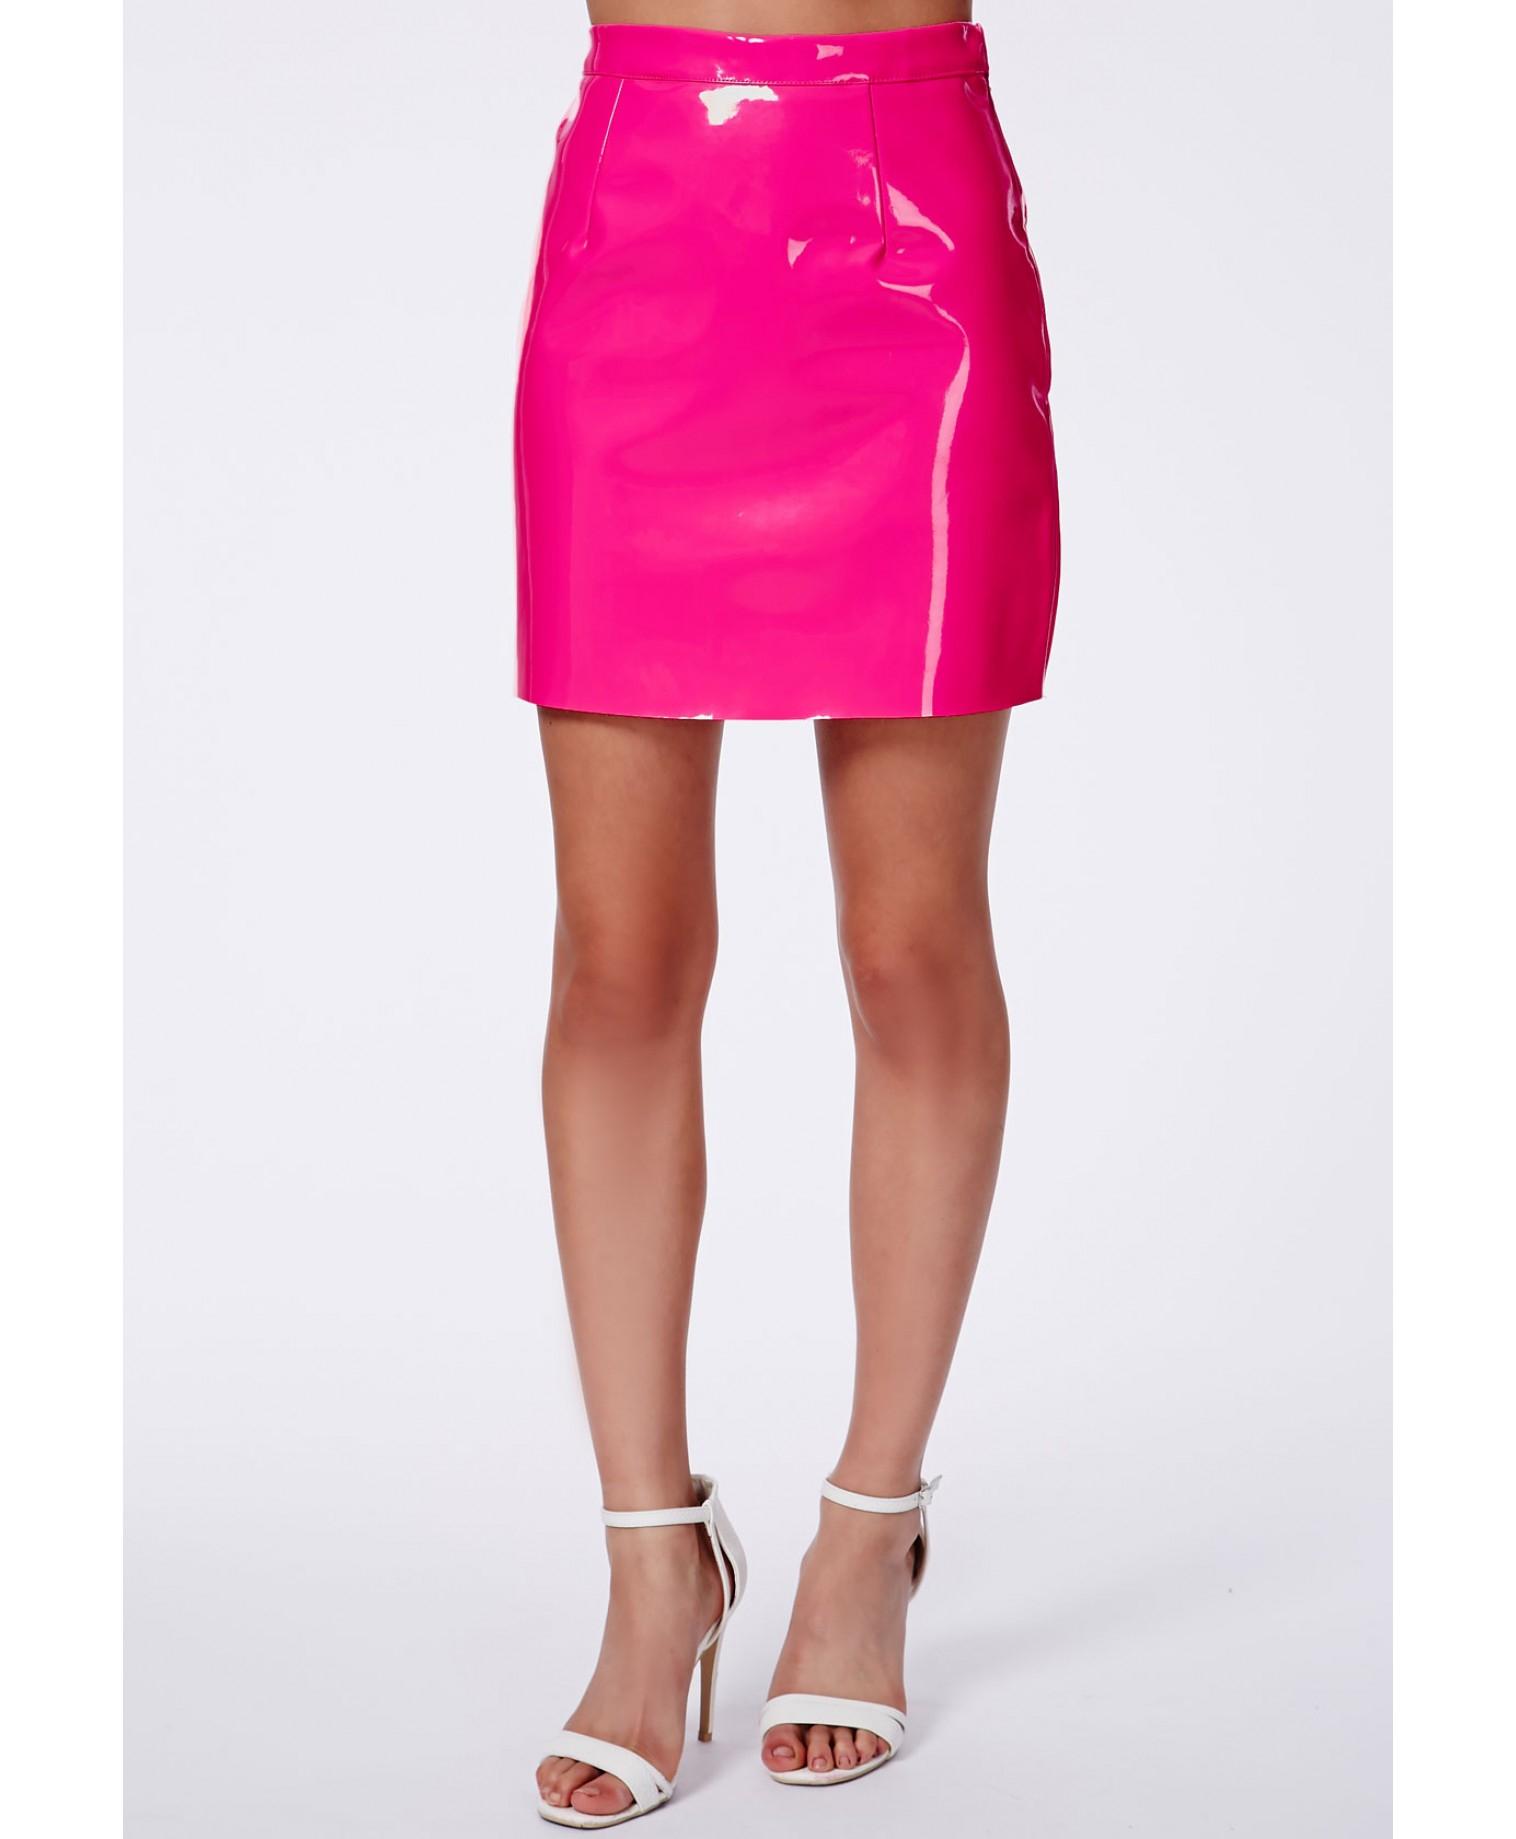 Final, Pink mini skirt join